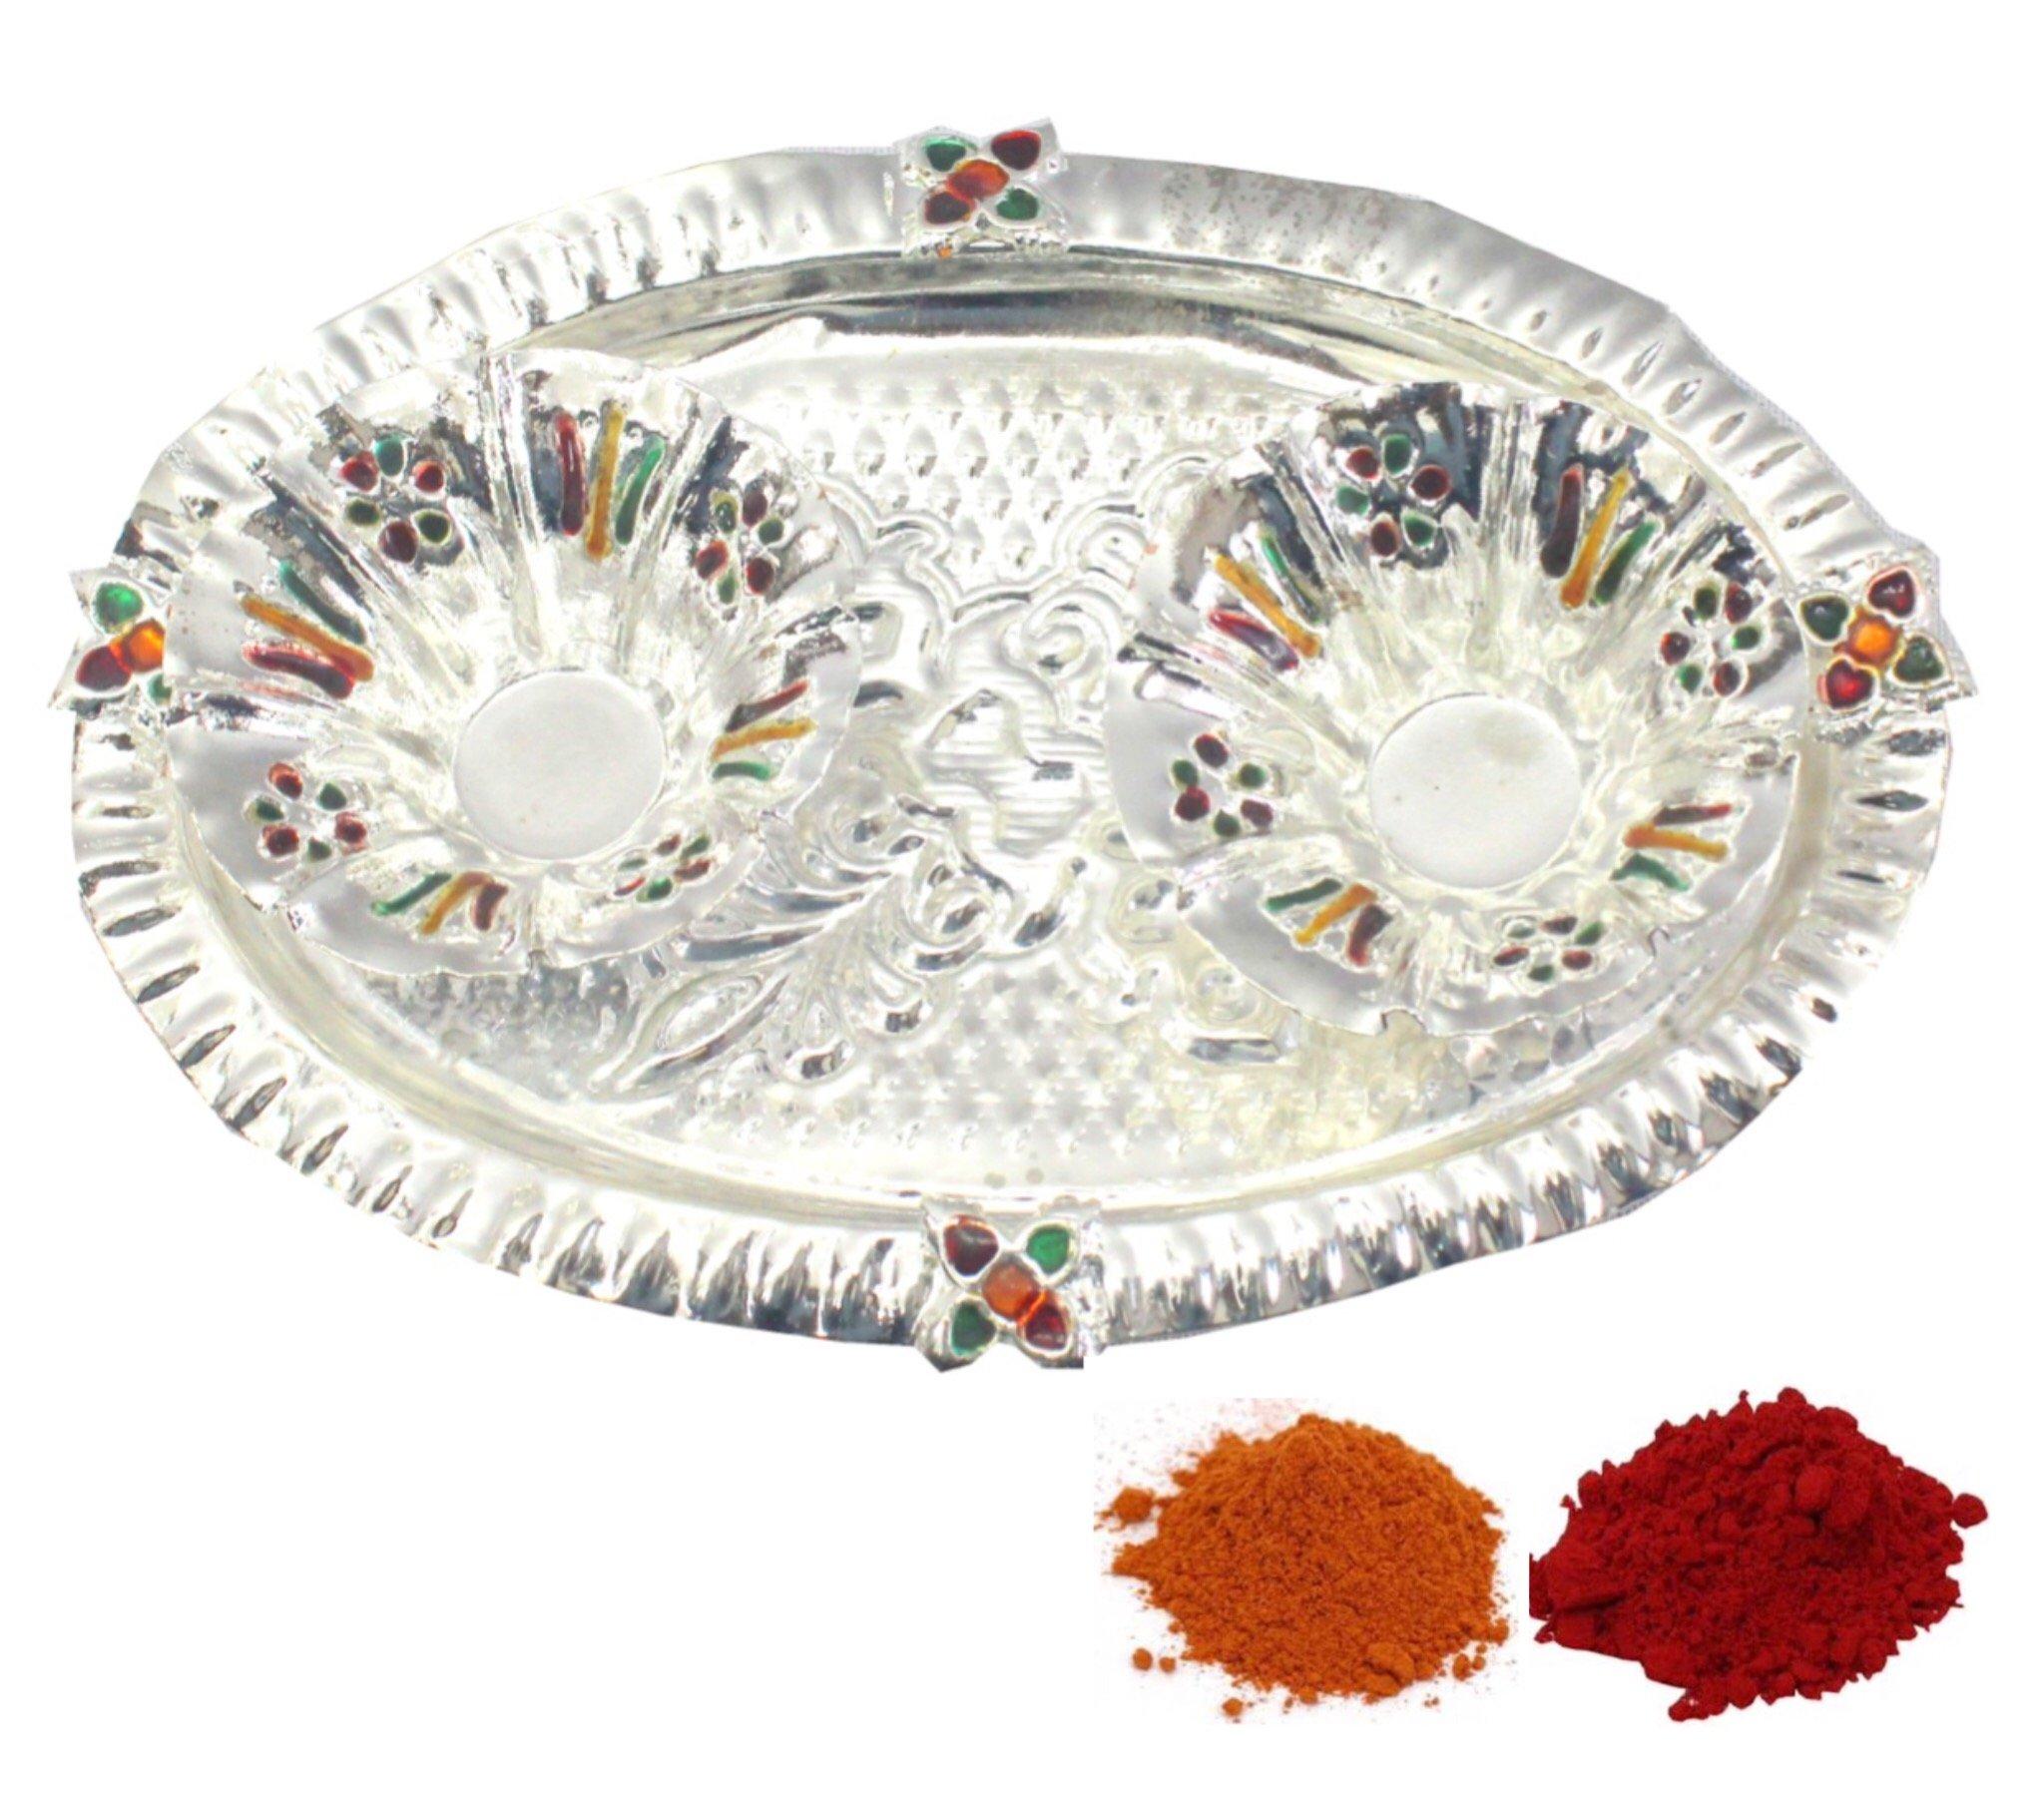 Indian Traditional Decorative Pooja thali Beautiful Lakshmi Festival Ethnic Gift for her/Kankavati / Diwali/Indian Handicraft/Home / Temple/Office / Wedding Gift/Bulk Gift. GS11